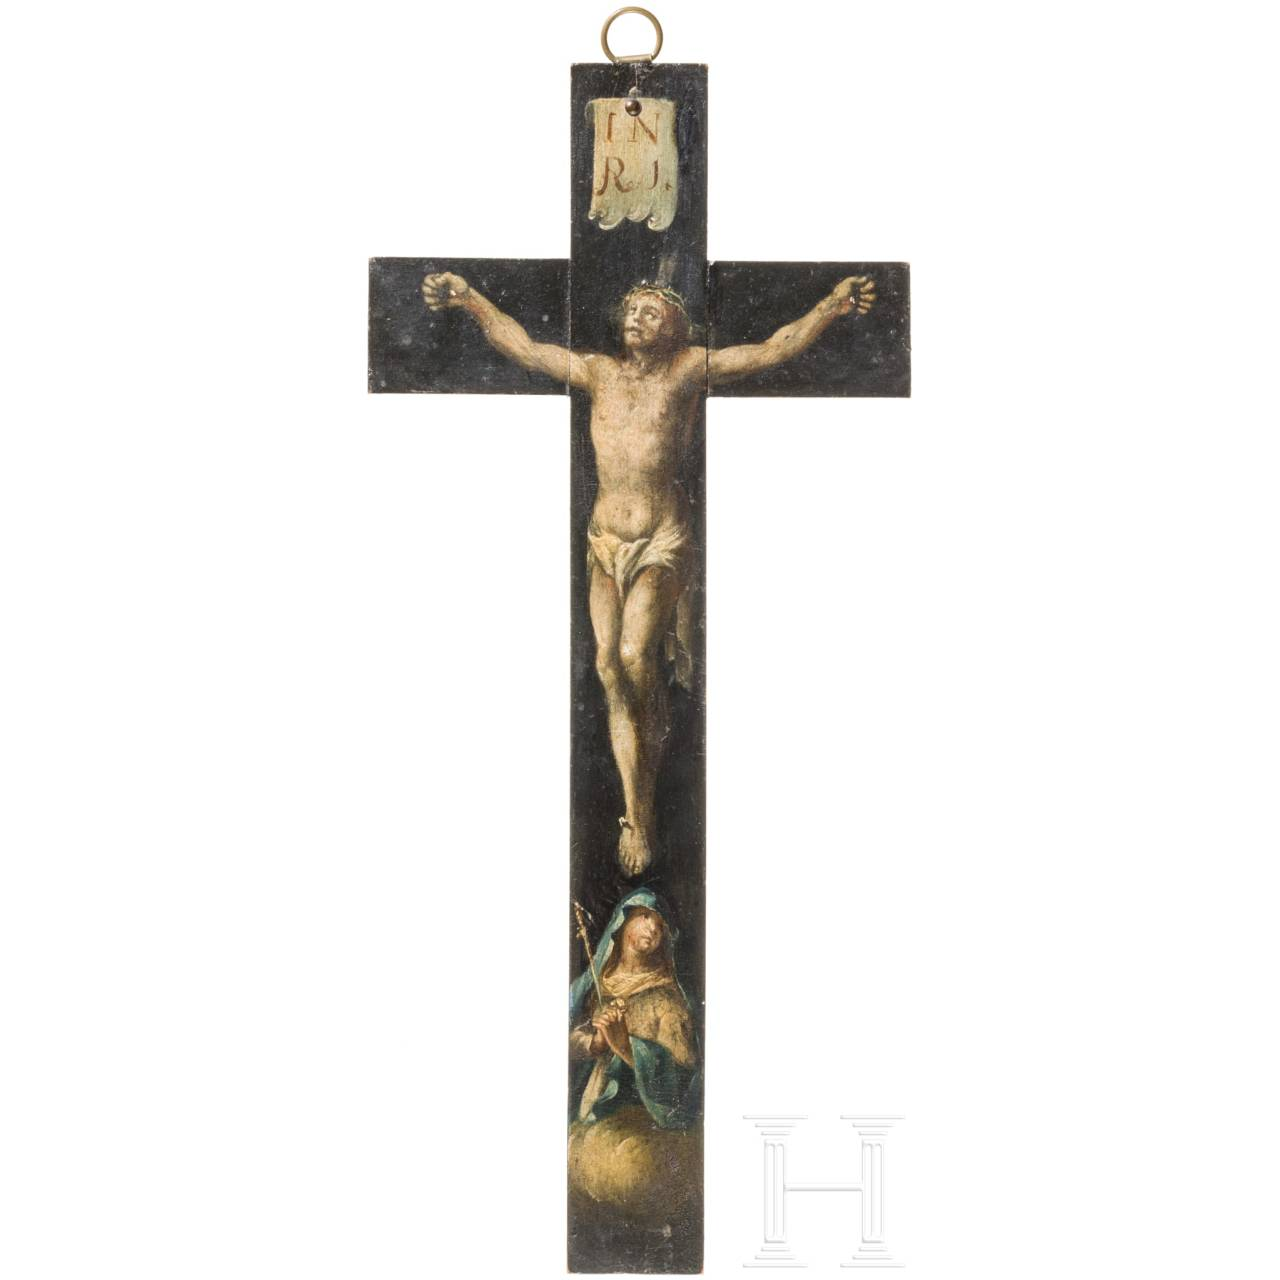 A southern German painted crucifix, circa 1700